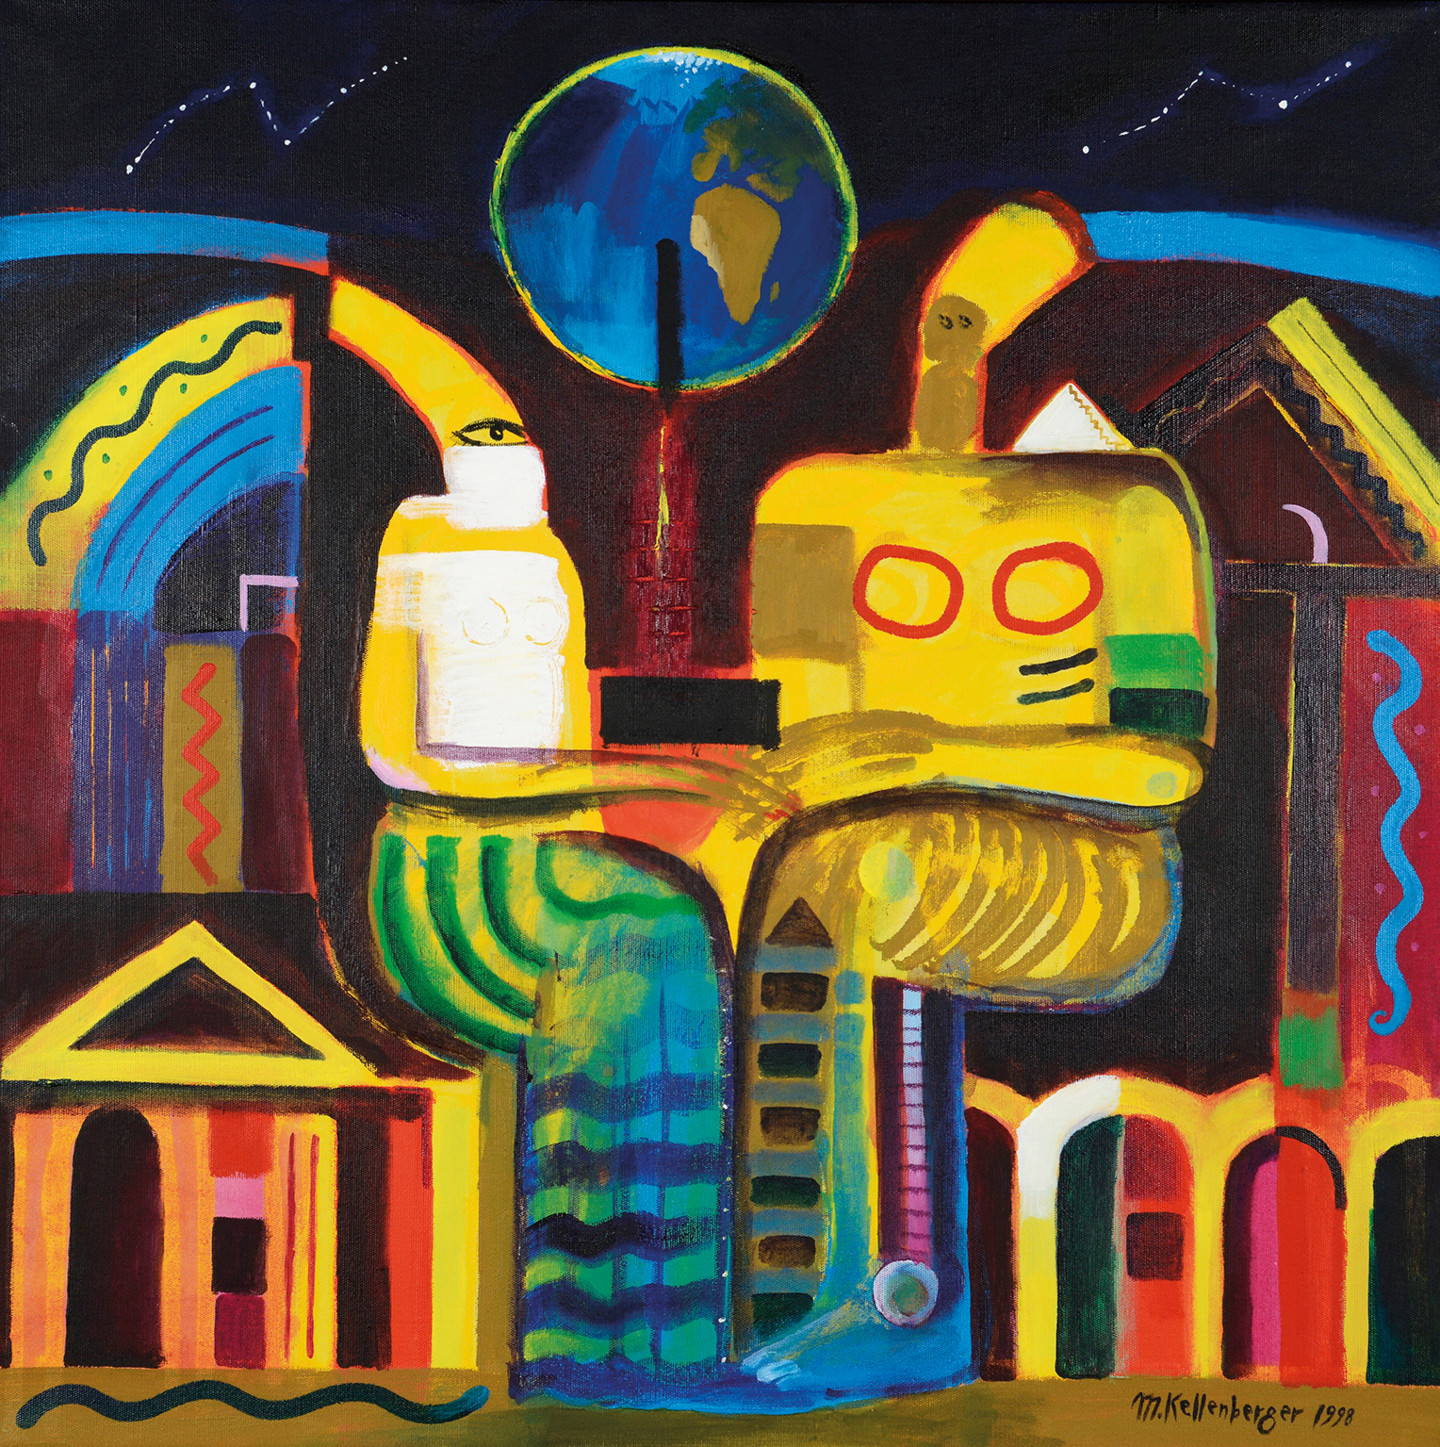 Martin Kellenberger - Black box of Africa